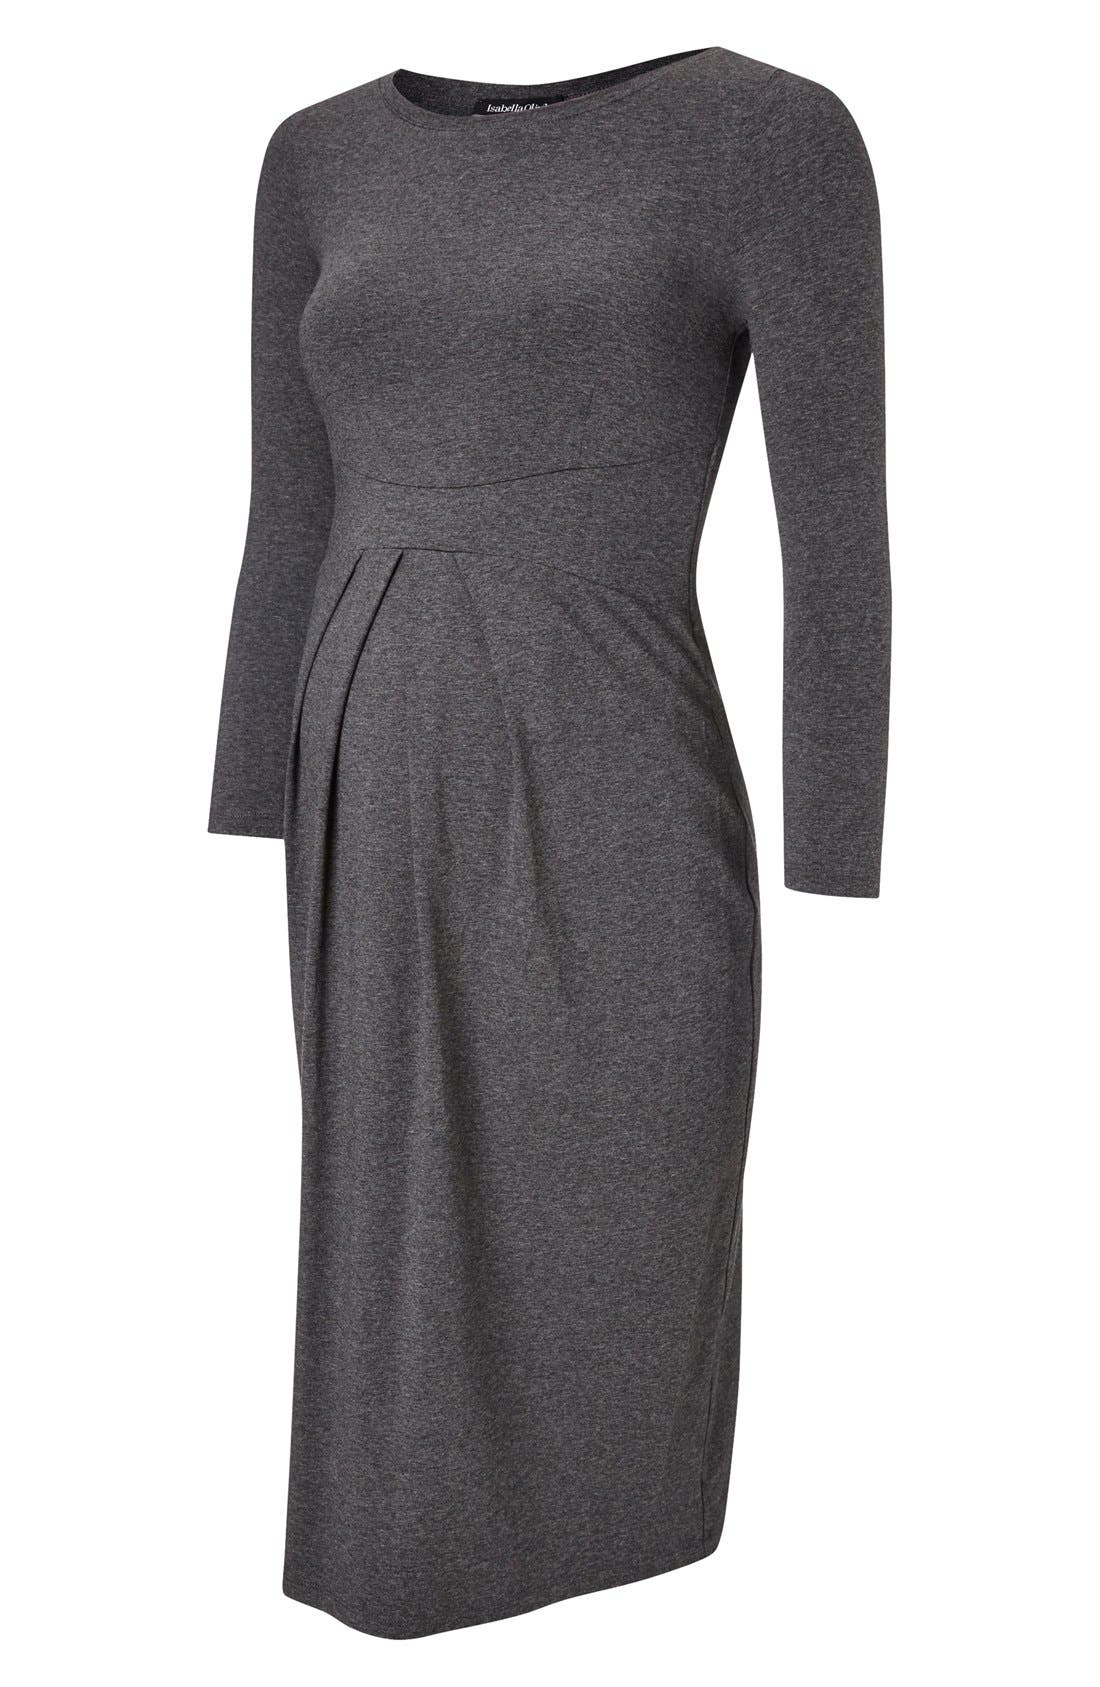 Ivybridge Jersey Maternity Dress,                             Alternate thumbnail 6, color,                             Dark Grey Marl